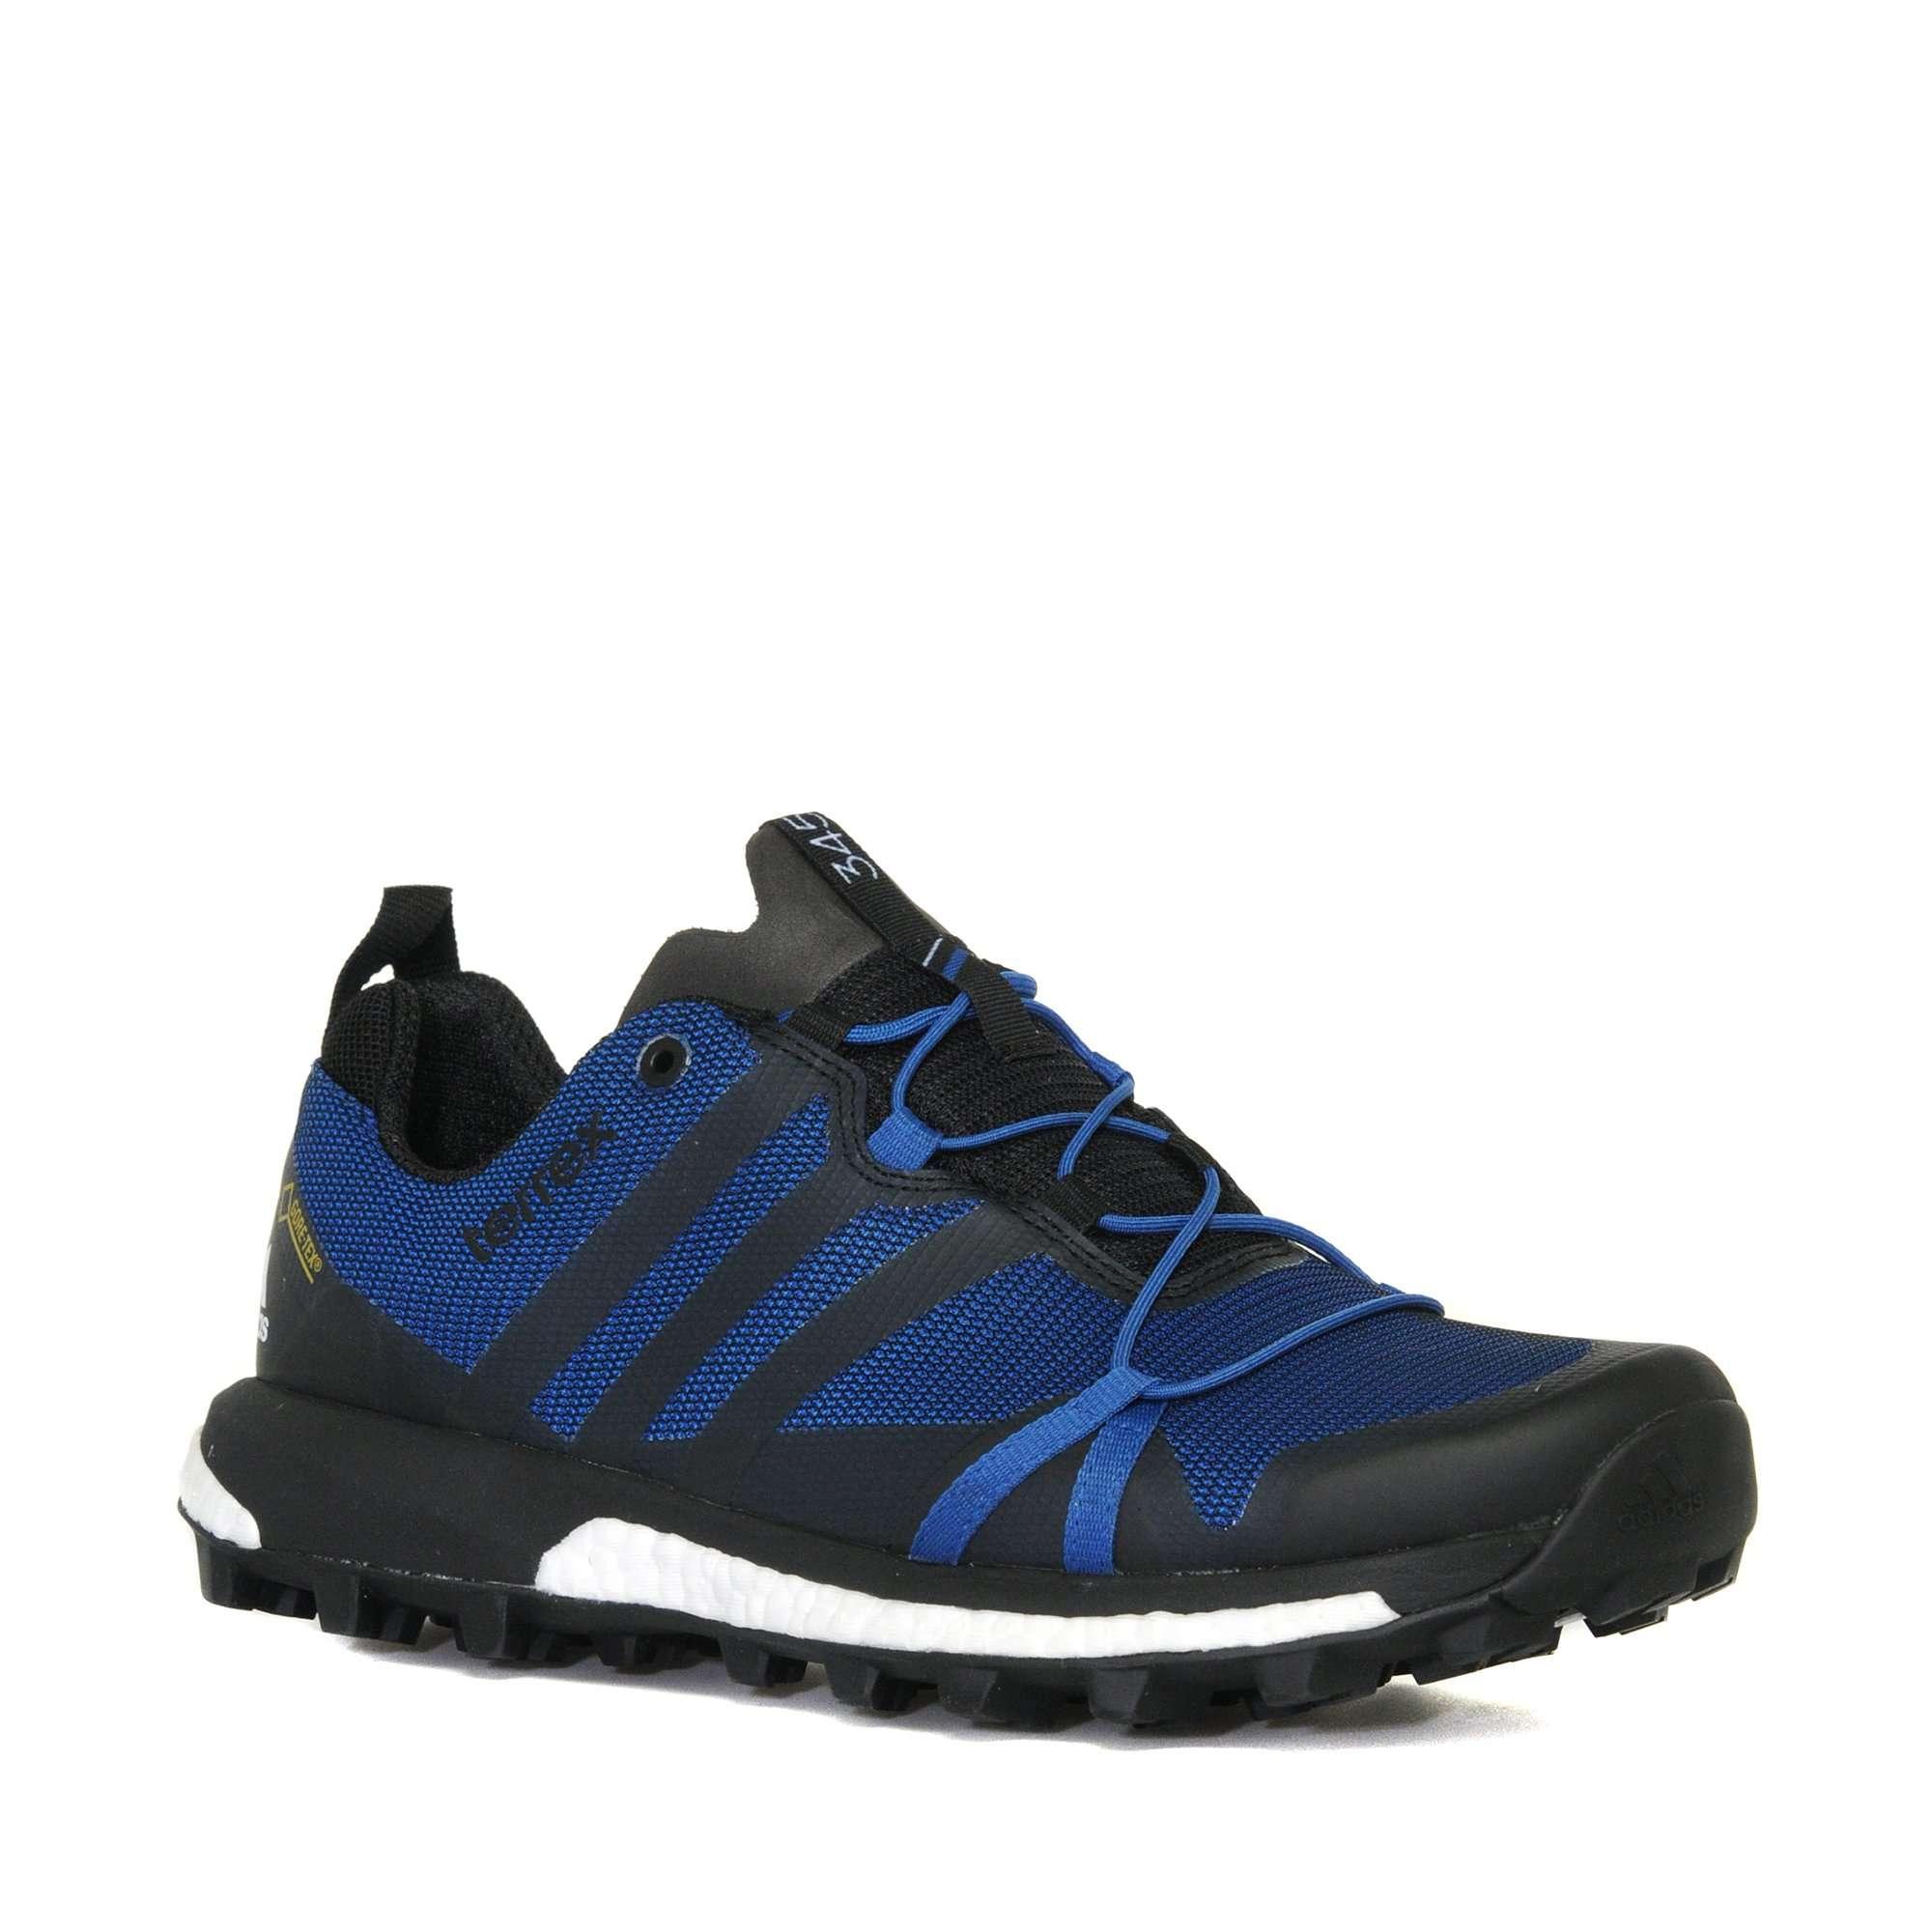 ADIDAS Men's Terrex Agravic Boost™ GORE-TEX® Shoe